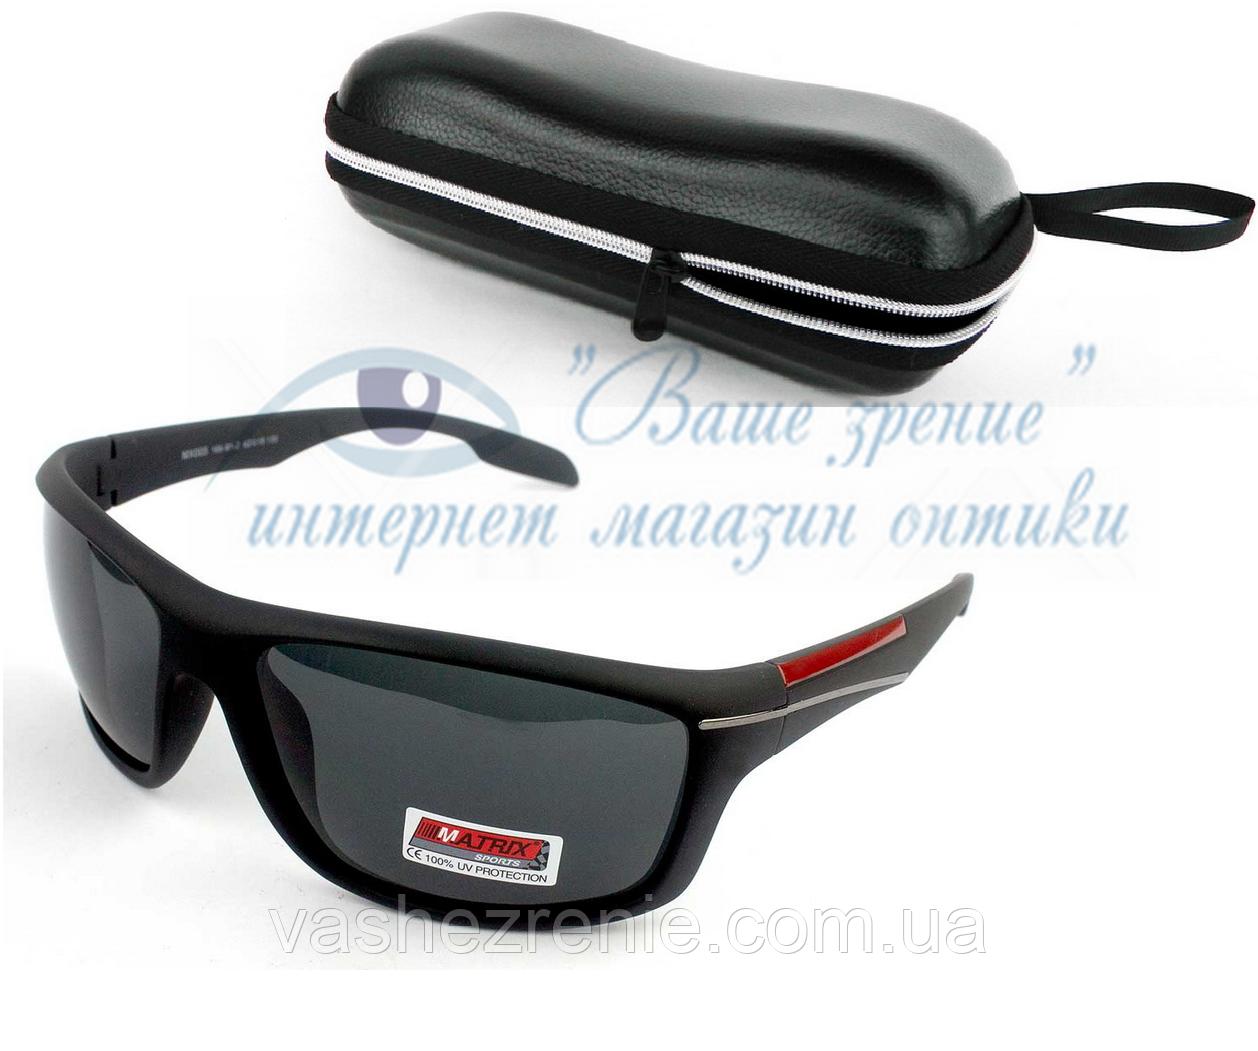 Очки солнцезащитные MATRIX POLARIZED 6524